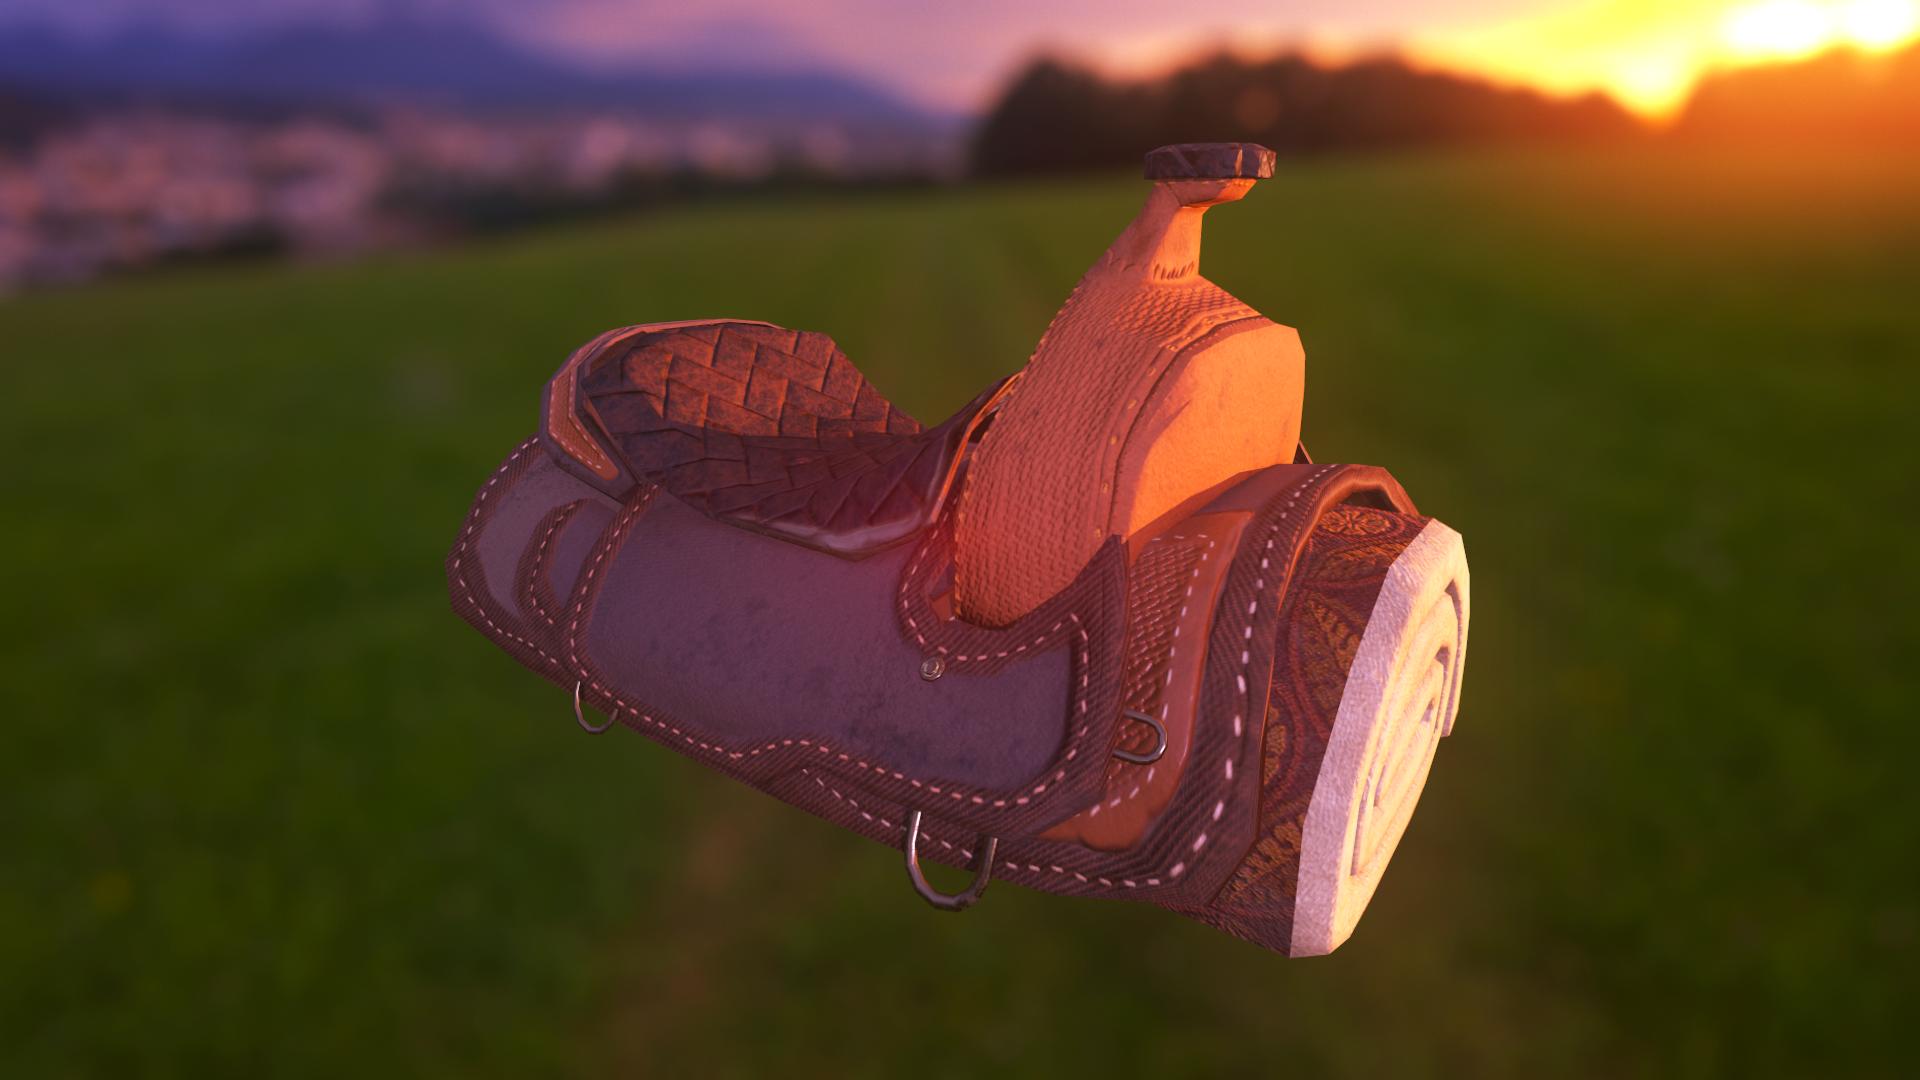 Saddle Concept Art